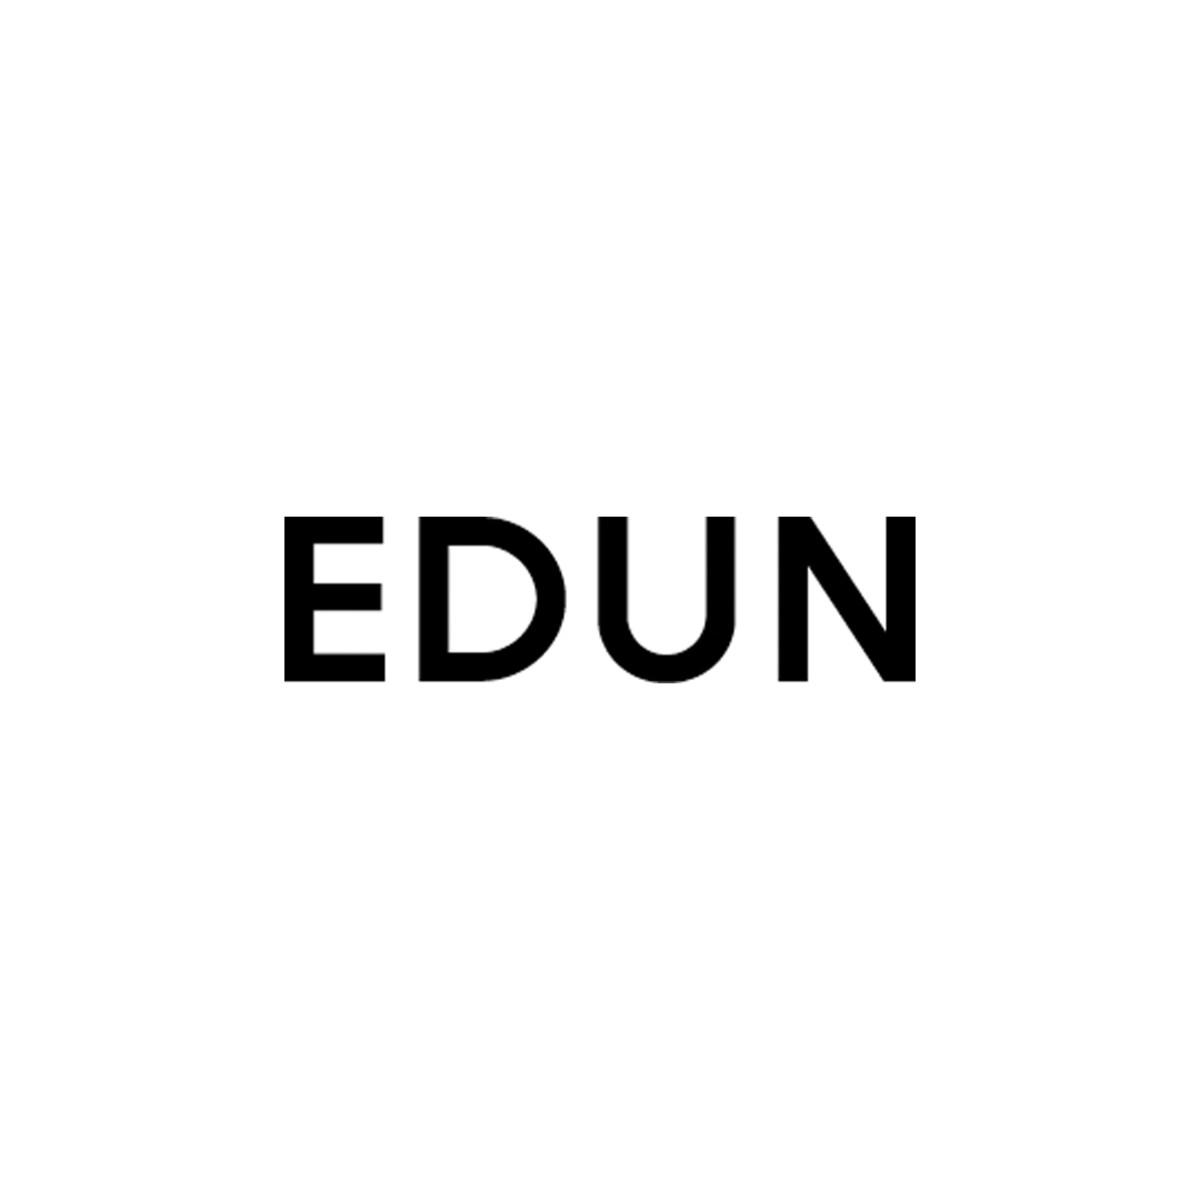 EDUN_Logo_Square.jpg